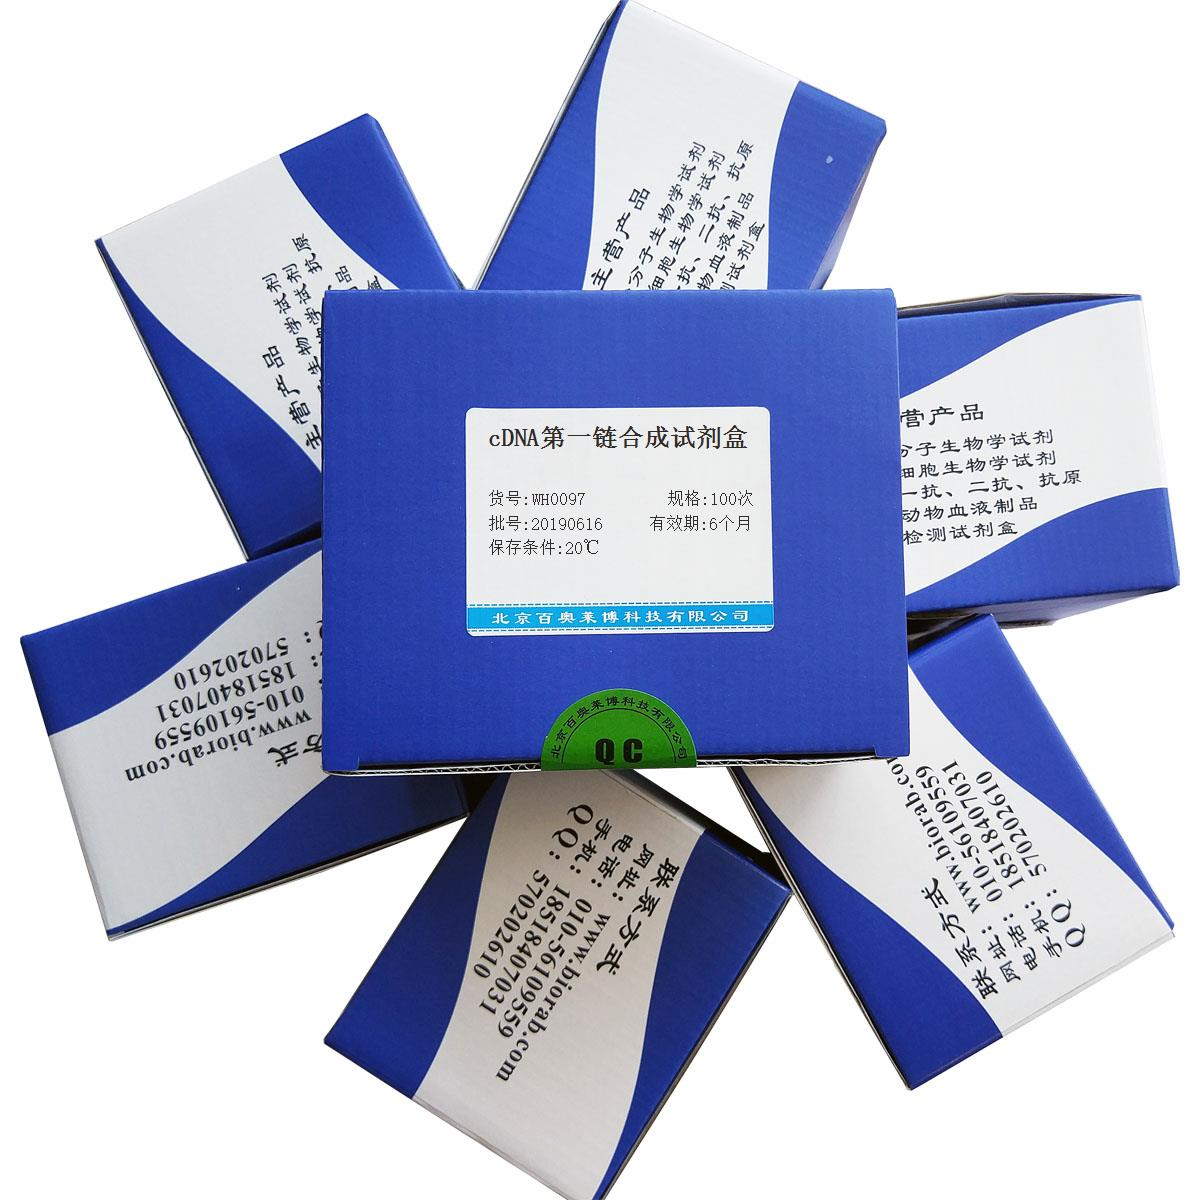 cDNA第一链合成试剂盒价格